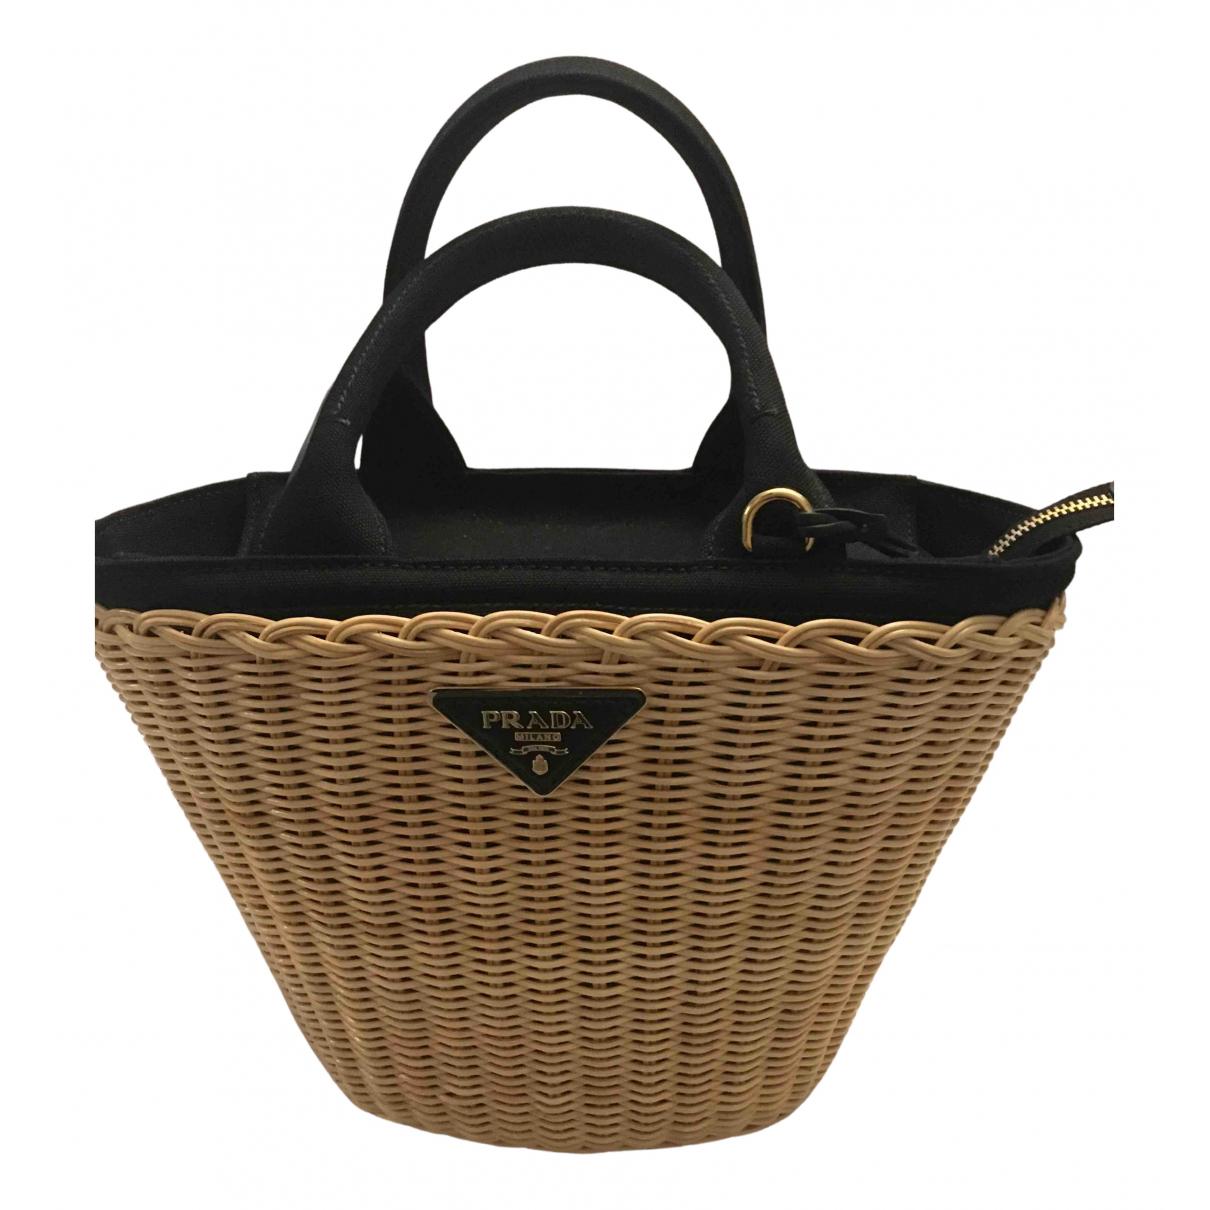 Prada N Black Wicker handbag for Women N